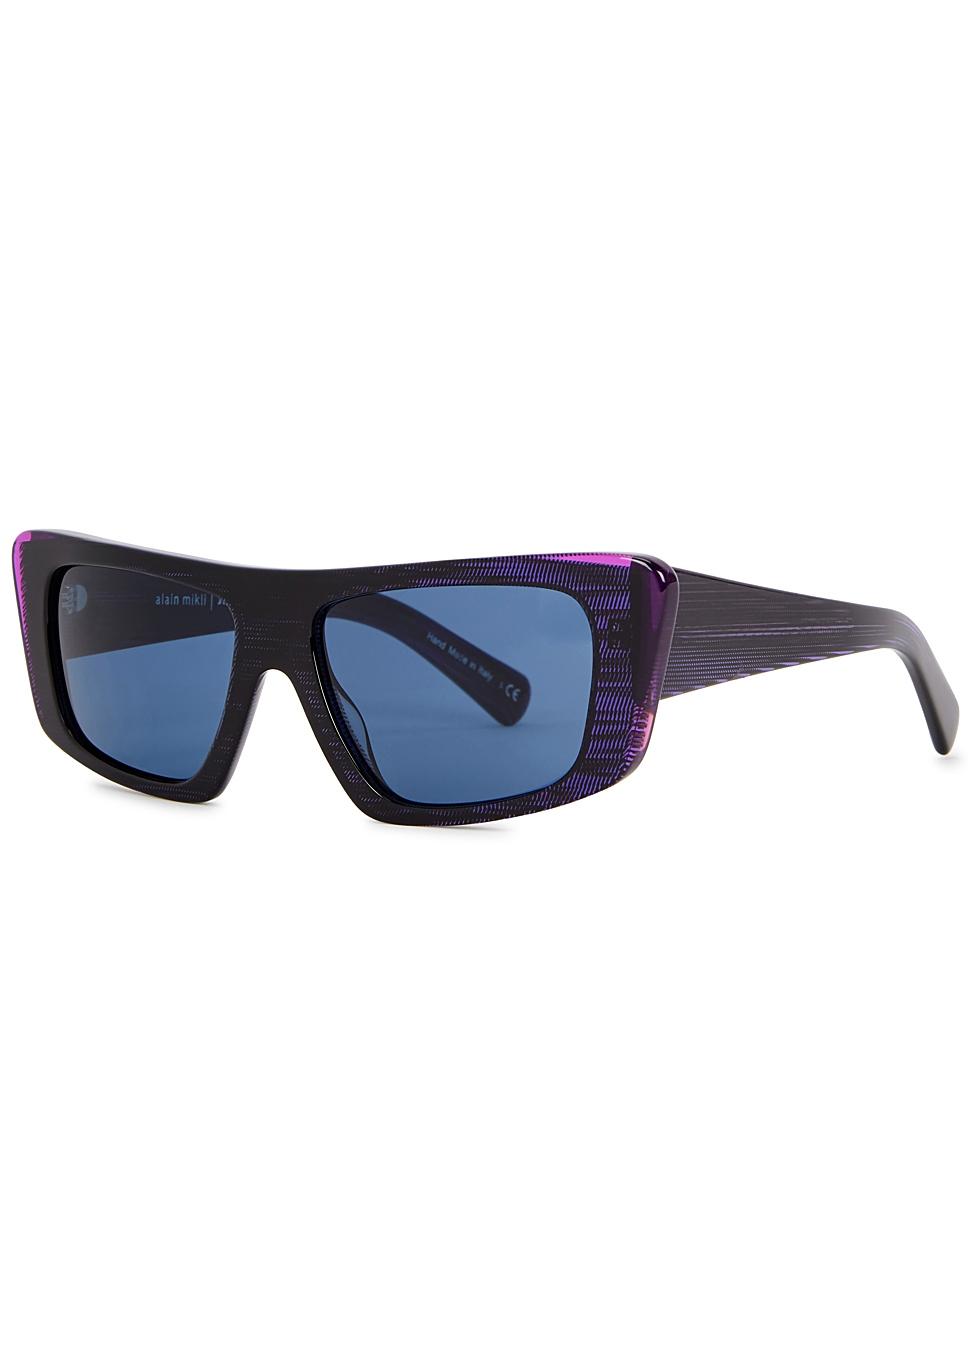 ALAIN MIKLI X Jeremy Scott Rectangle-Frame Sunglasses in Blue